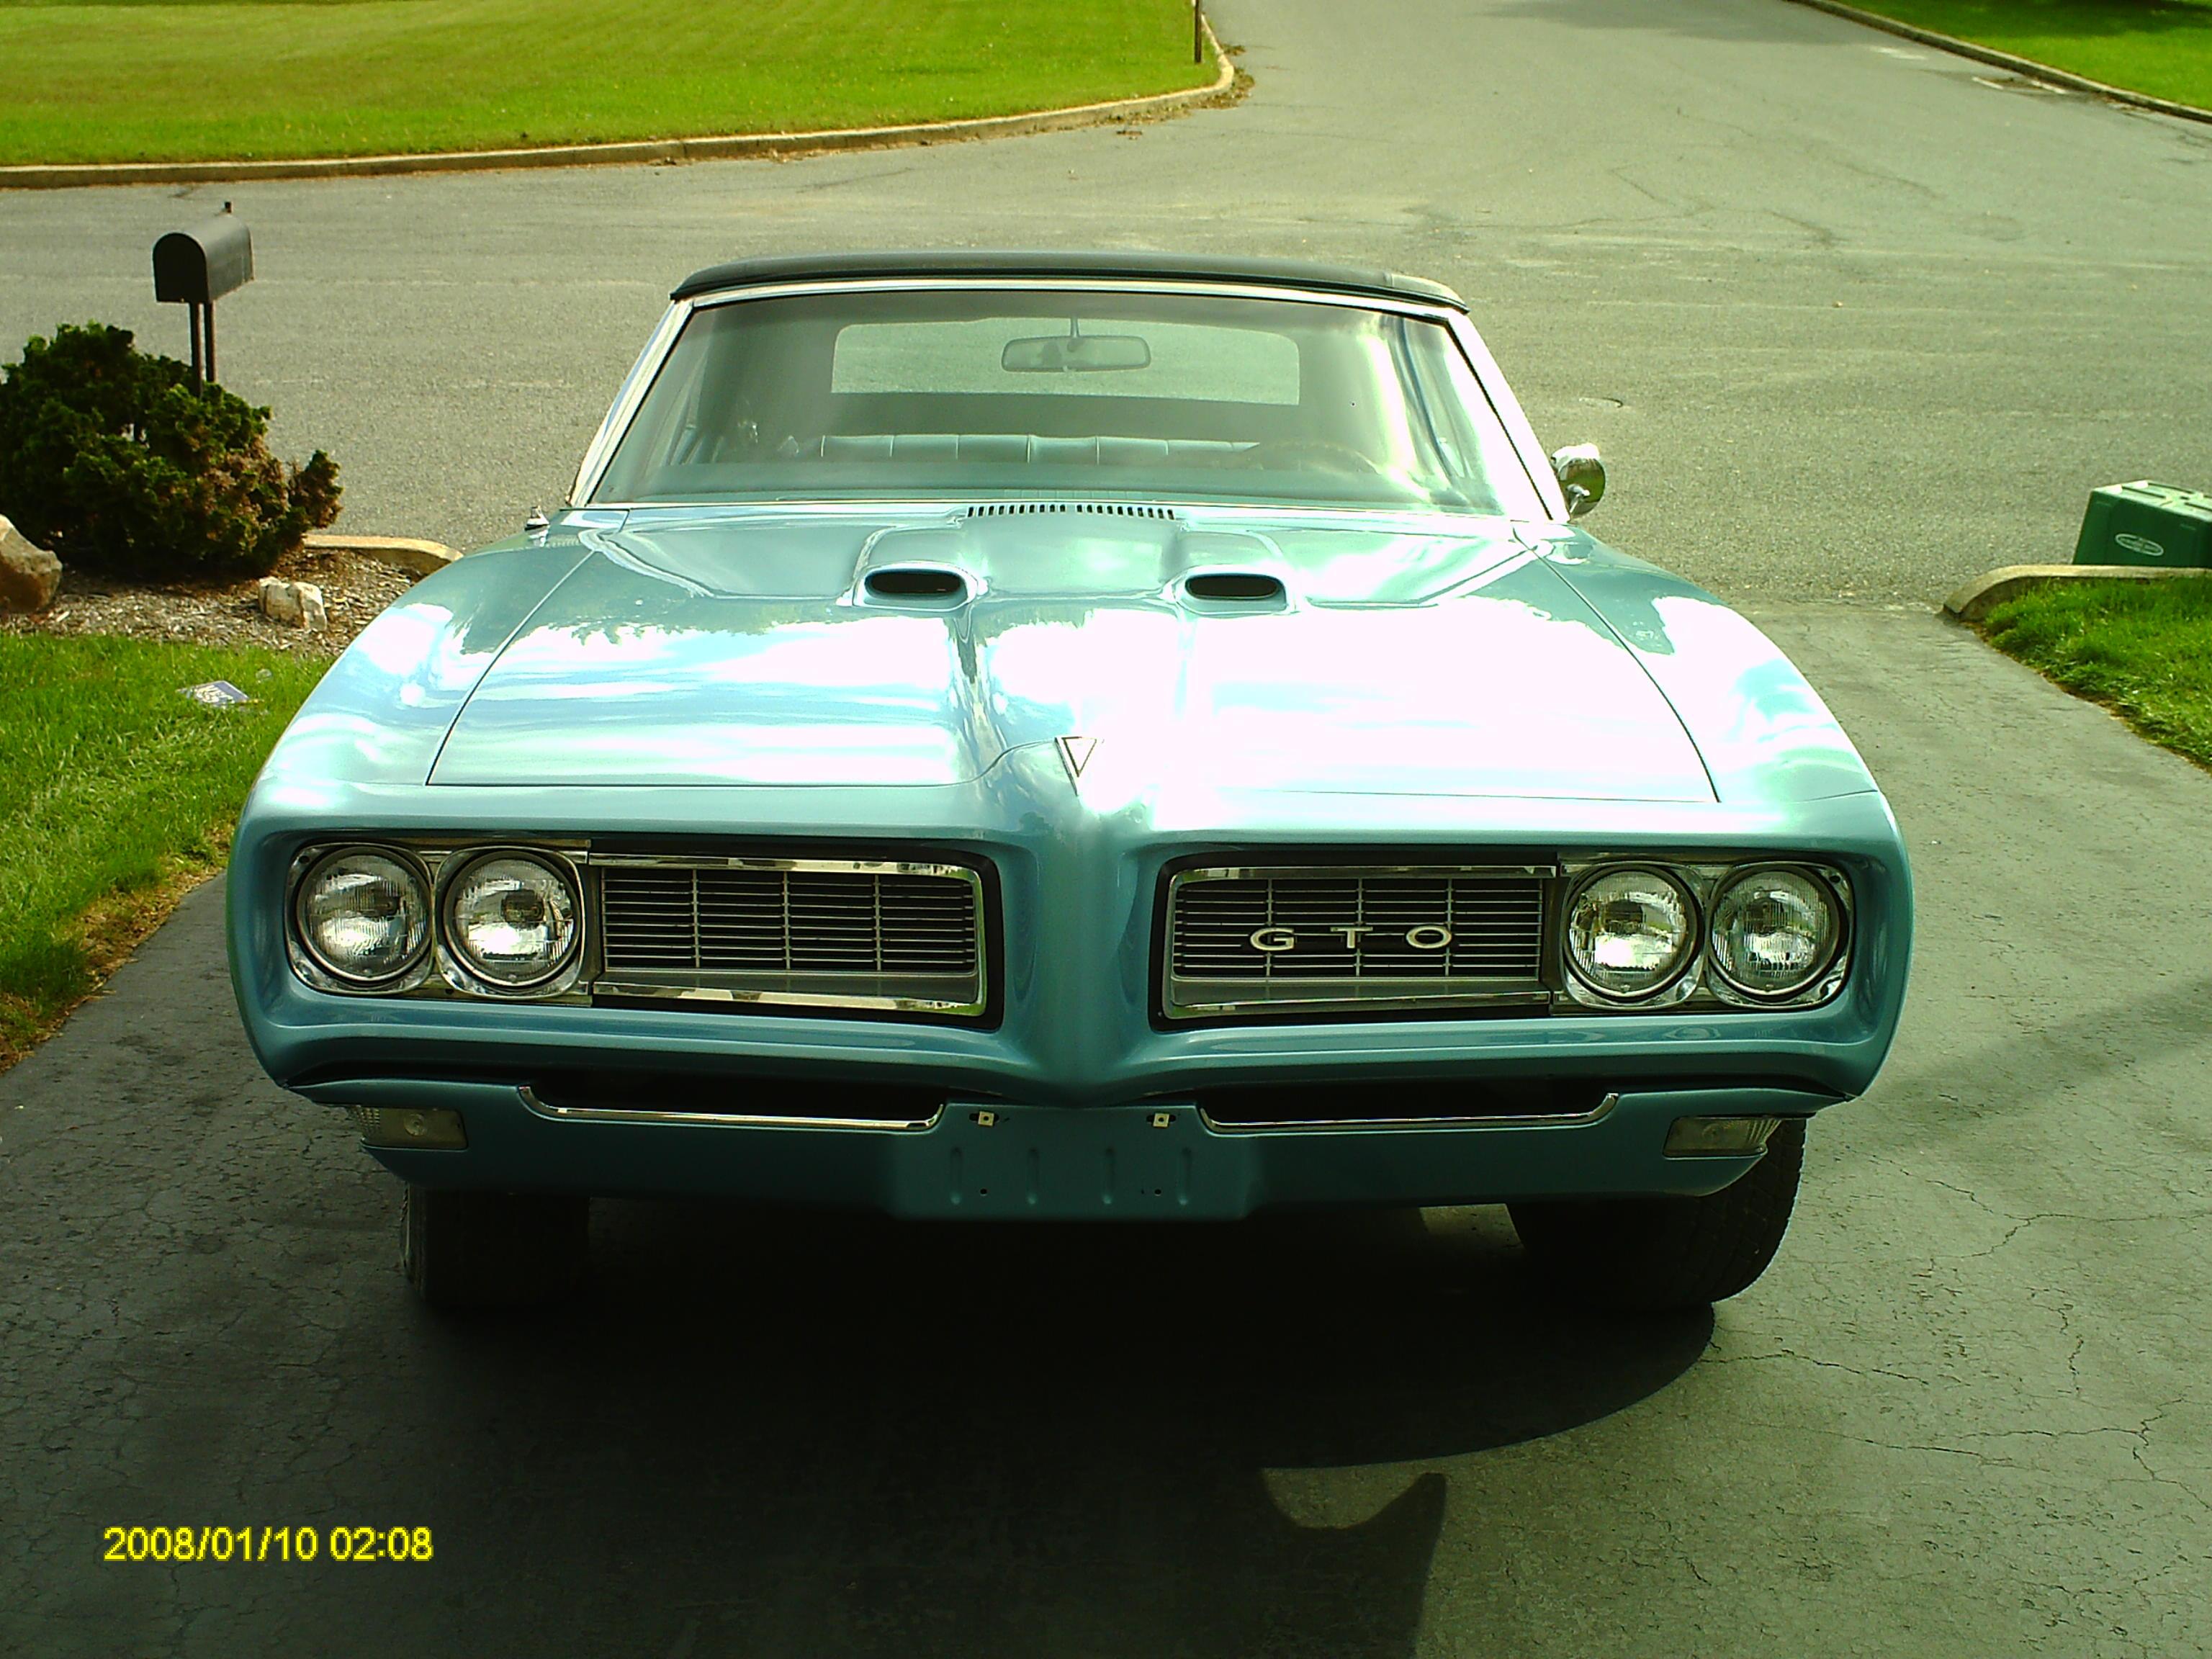 Fully Restored 1968 Pontiac GTO Convertible-1968-gto-convertible006.jpg